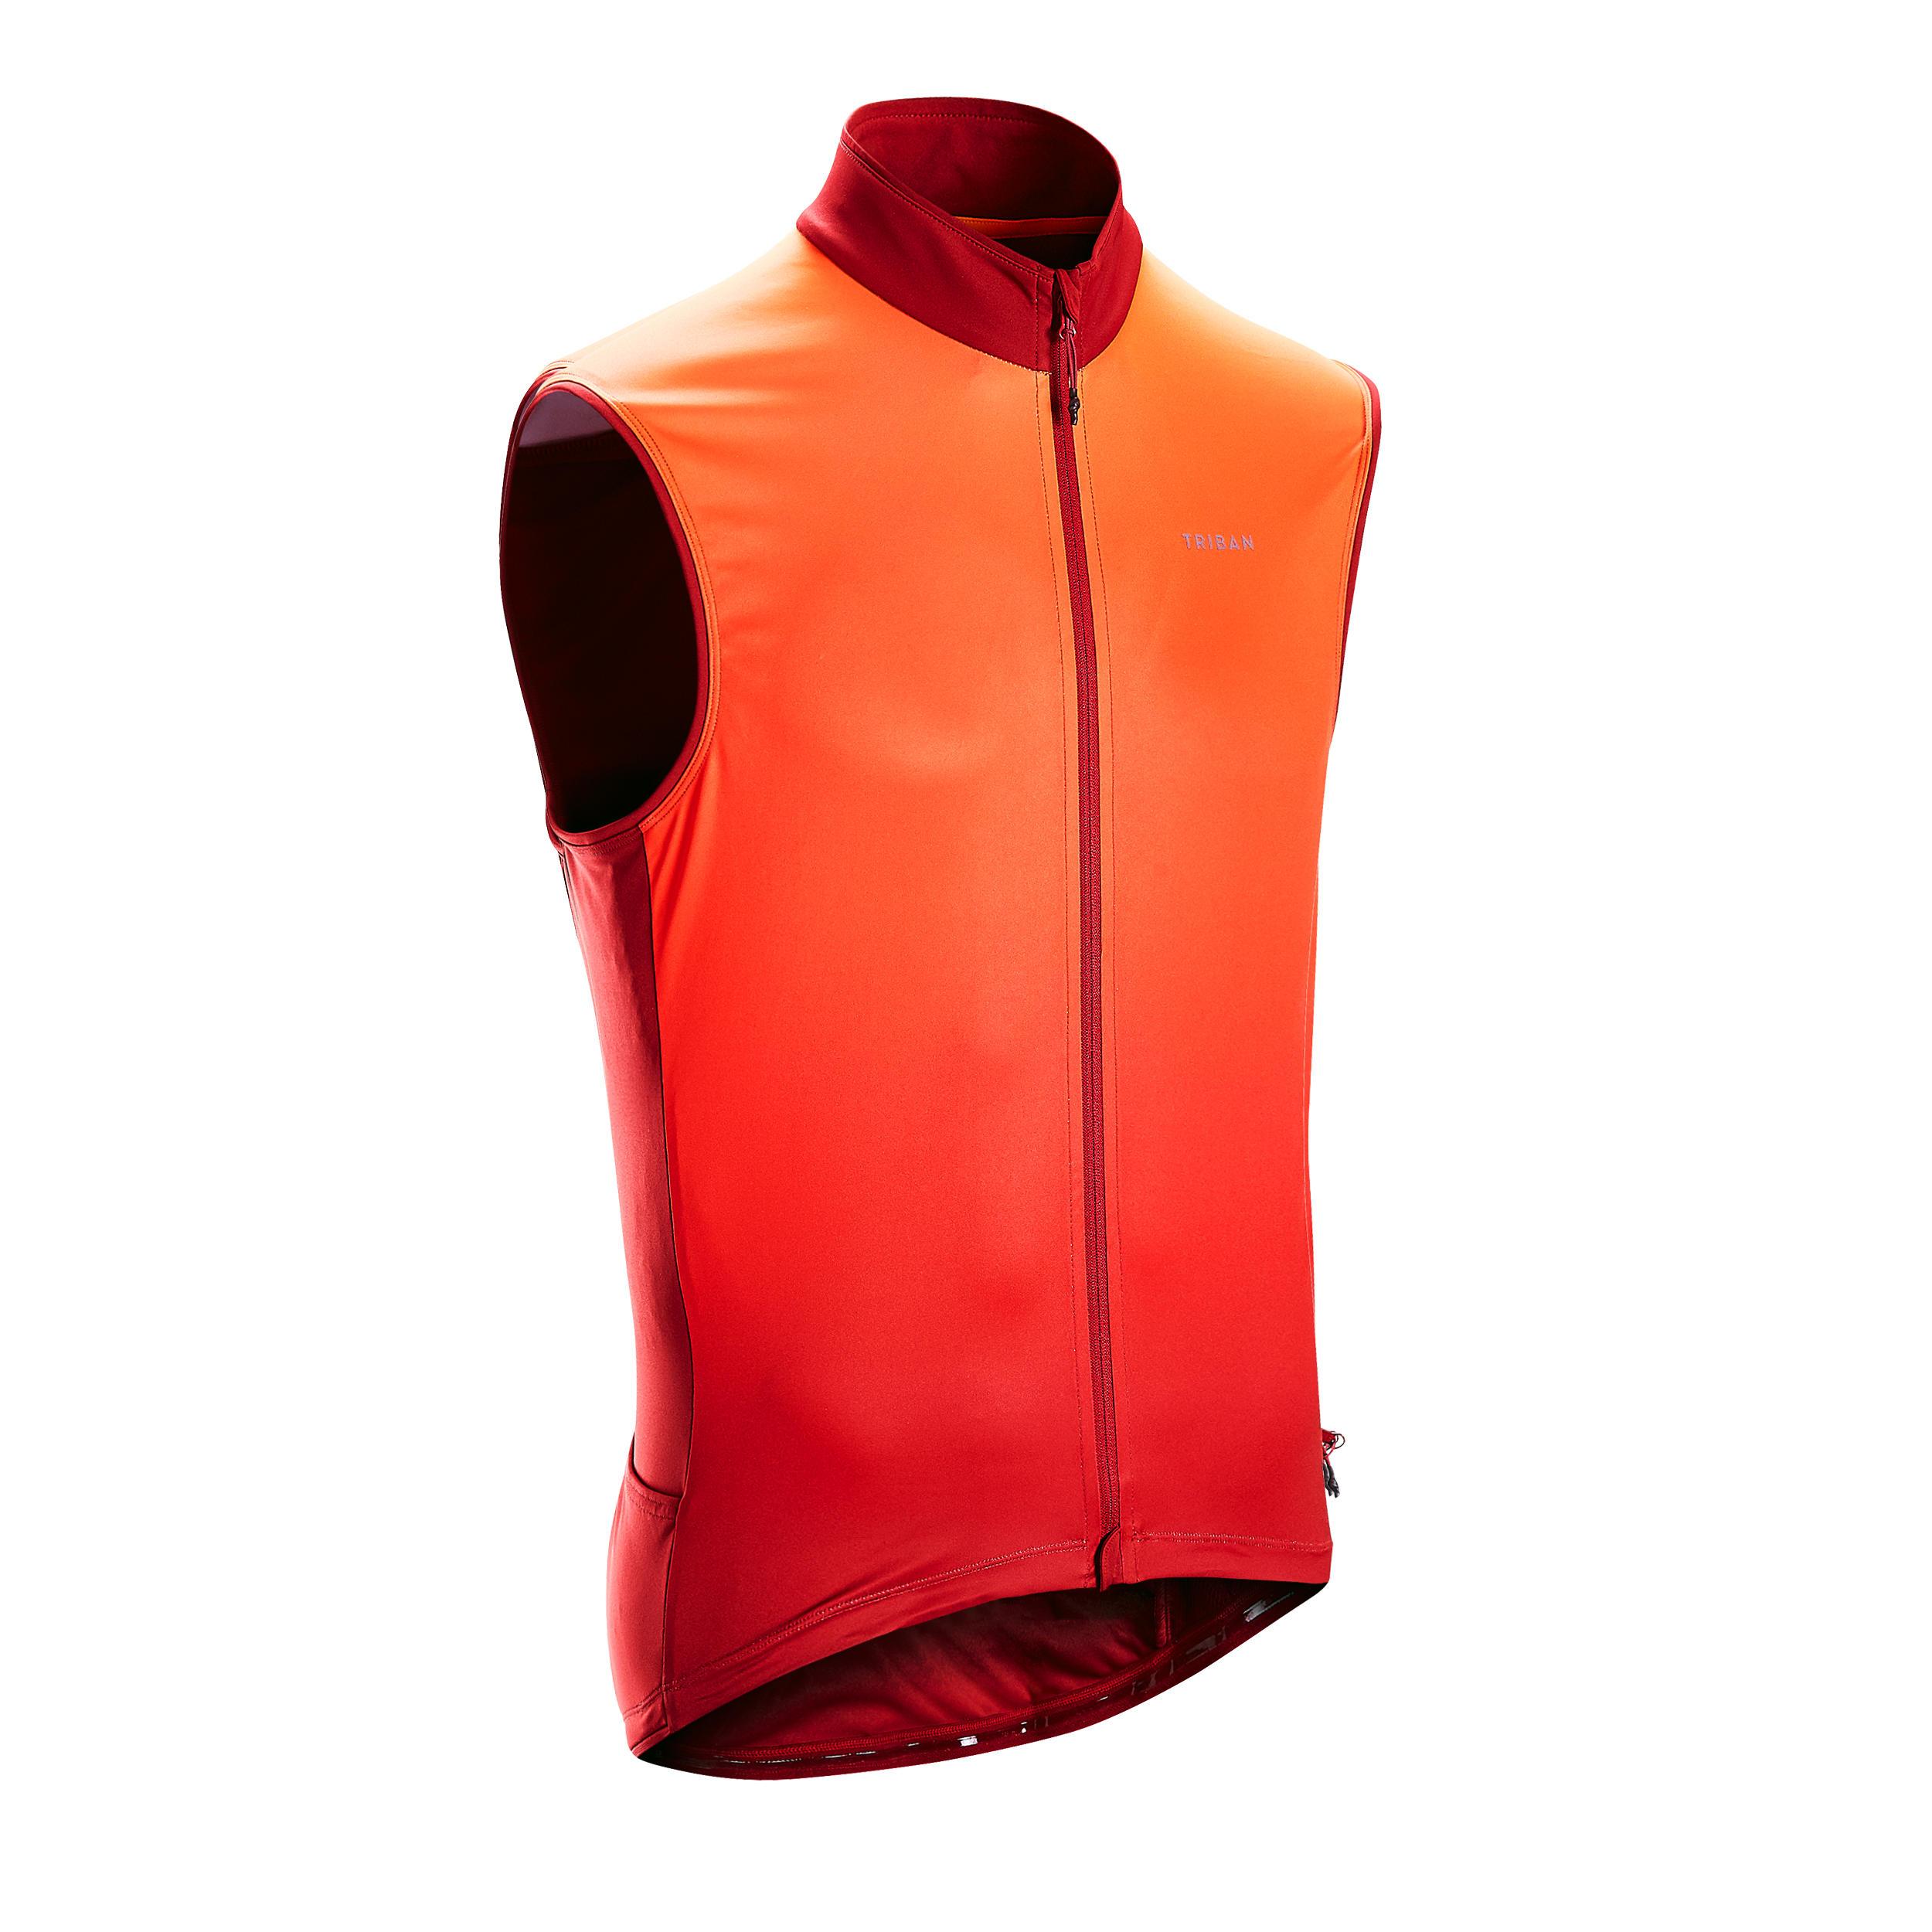 FAHRRADTRIKOT ÄRMELLOS RENNRAD HERREN RC500   Sportbekleidung > Trikots > Fahrradtrikots   Triban